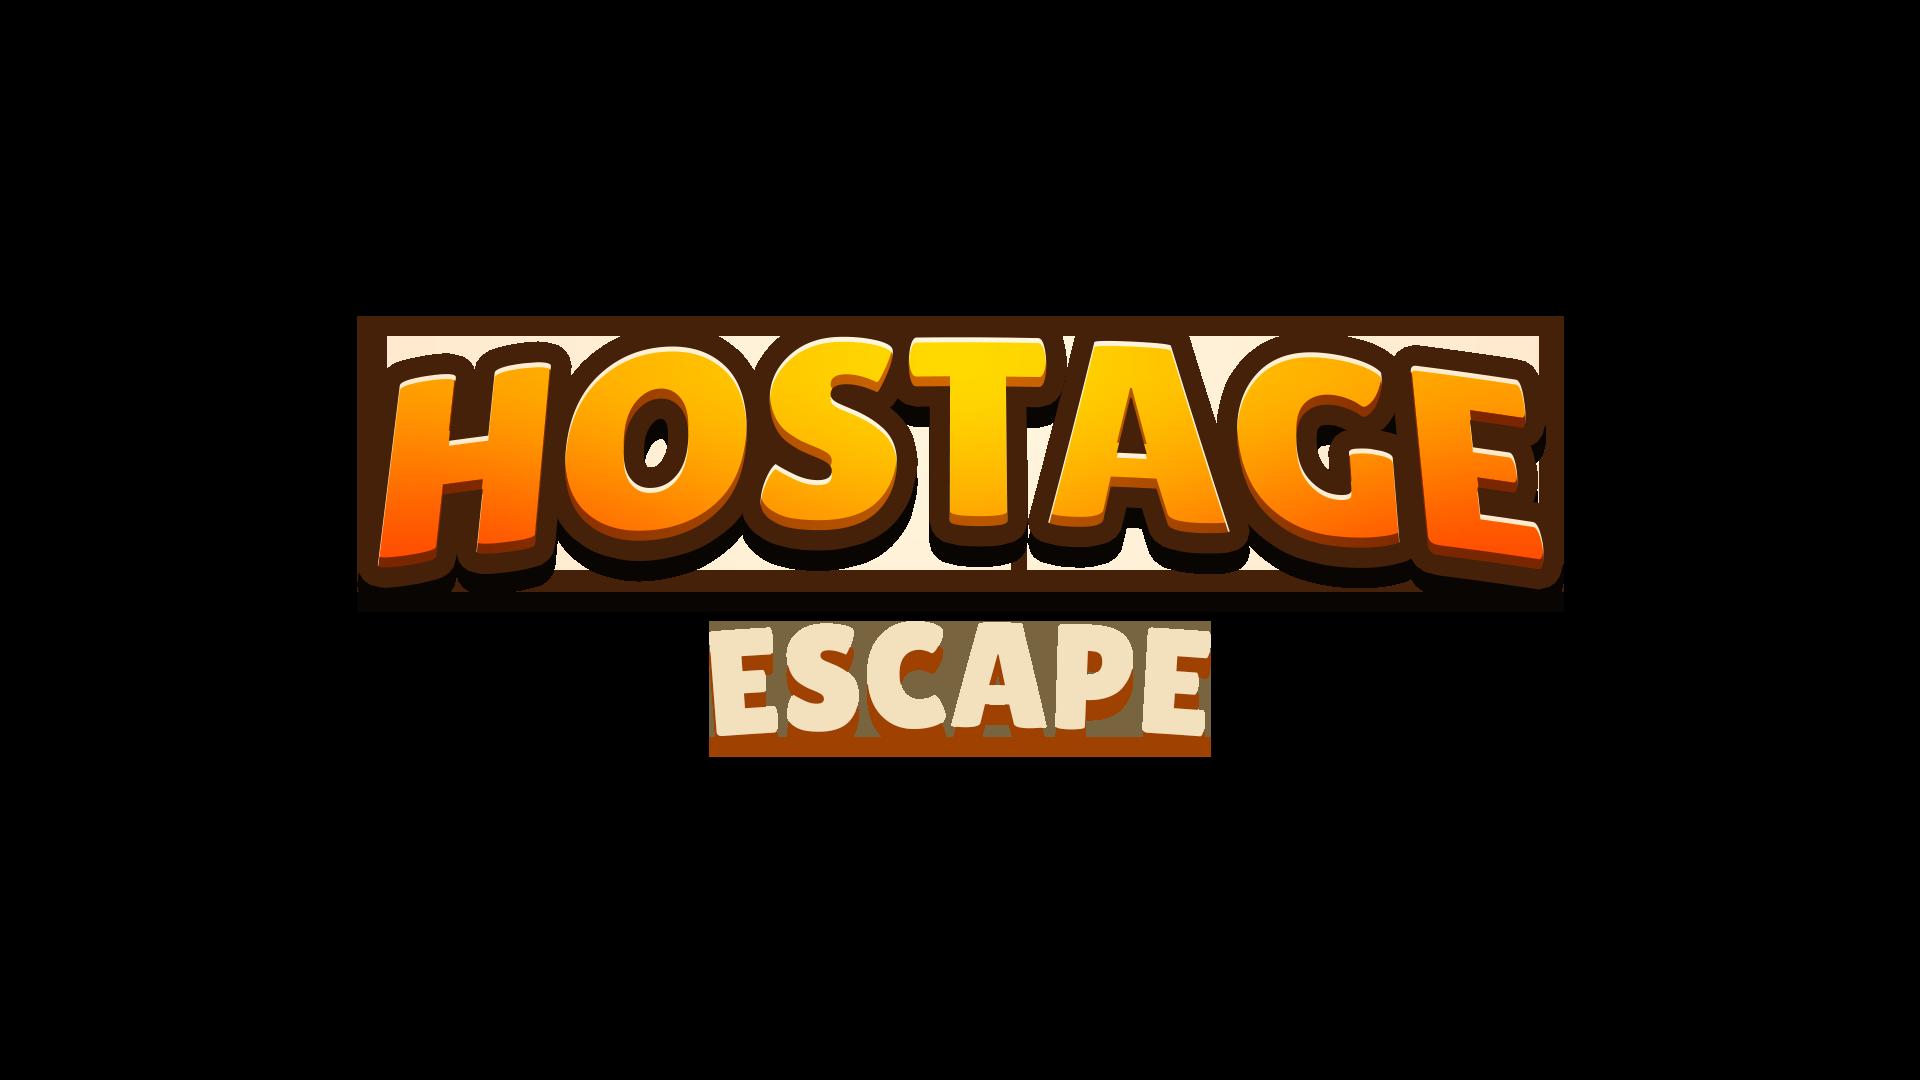 Hostage Escape